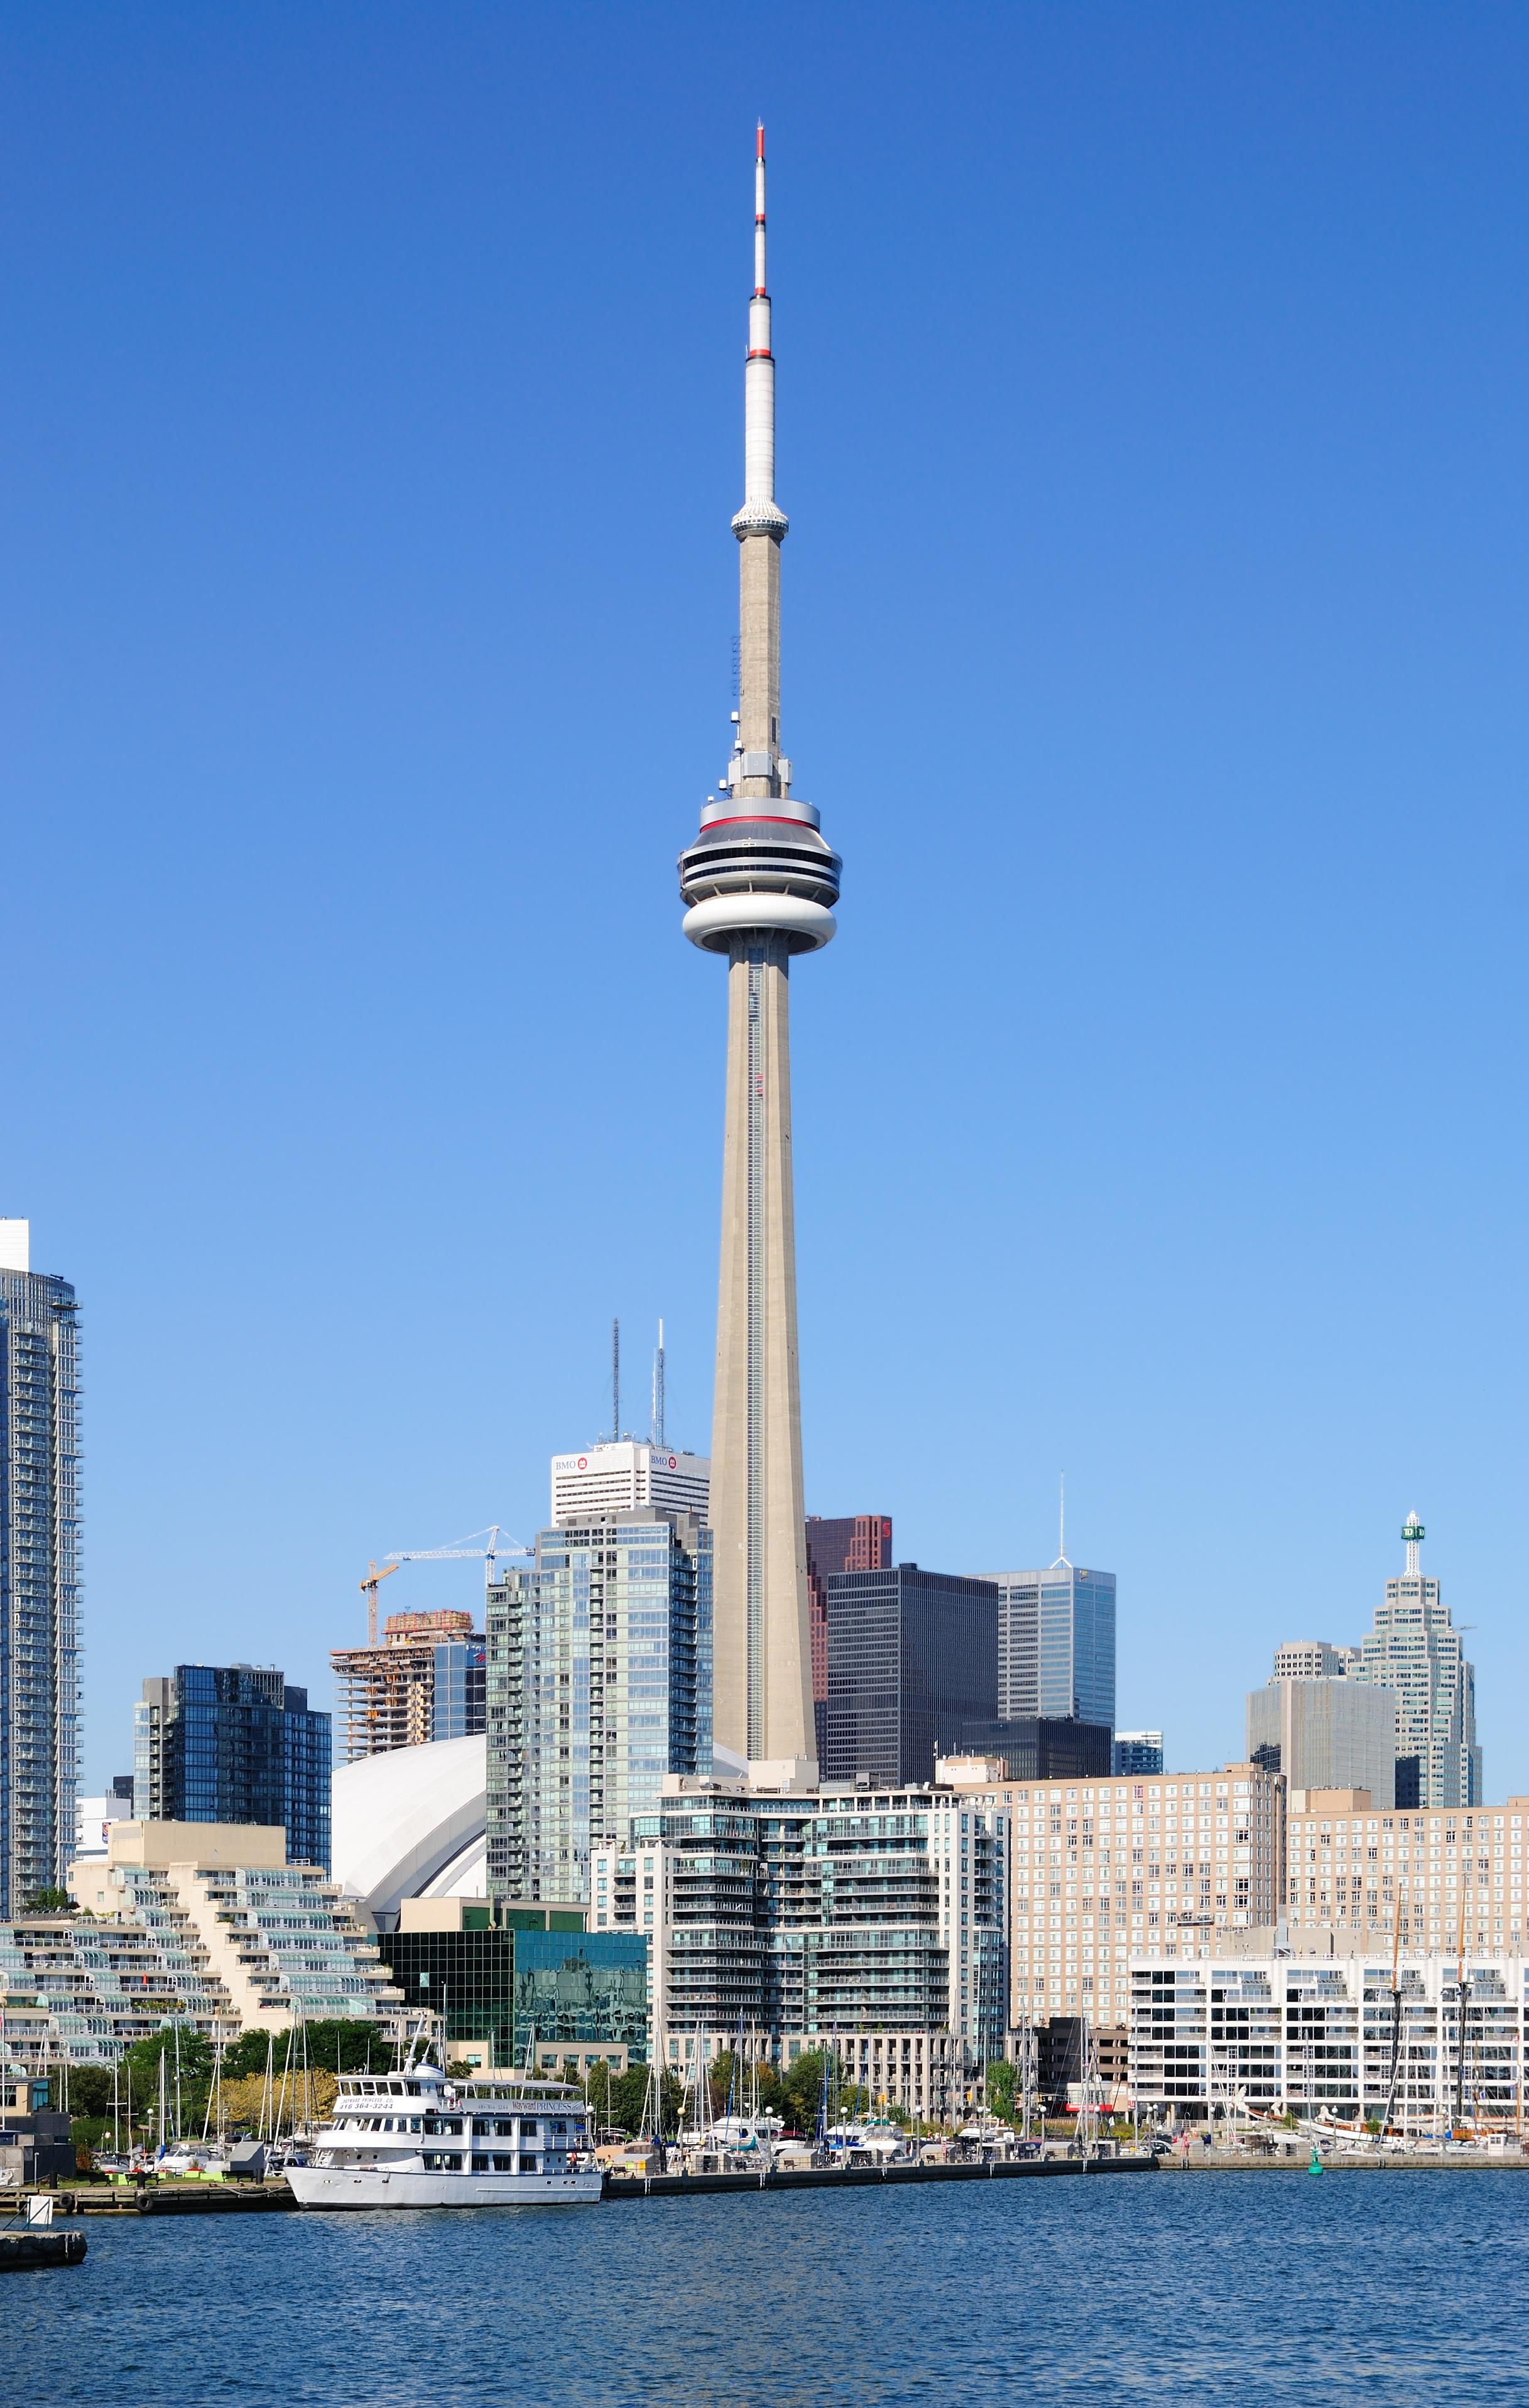 Toronto_-_ON_-_Toronto_Harbourfront7.jpg (2434×3834)